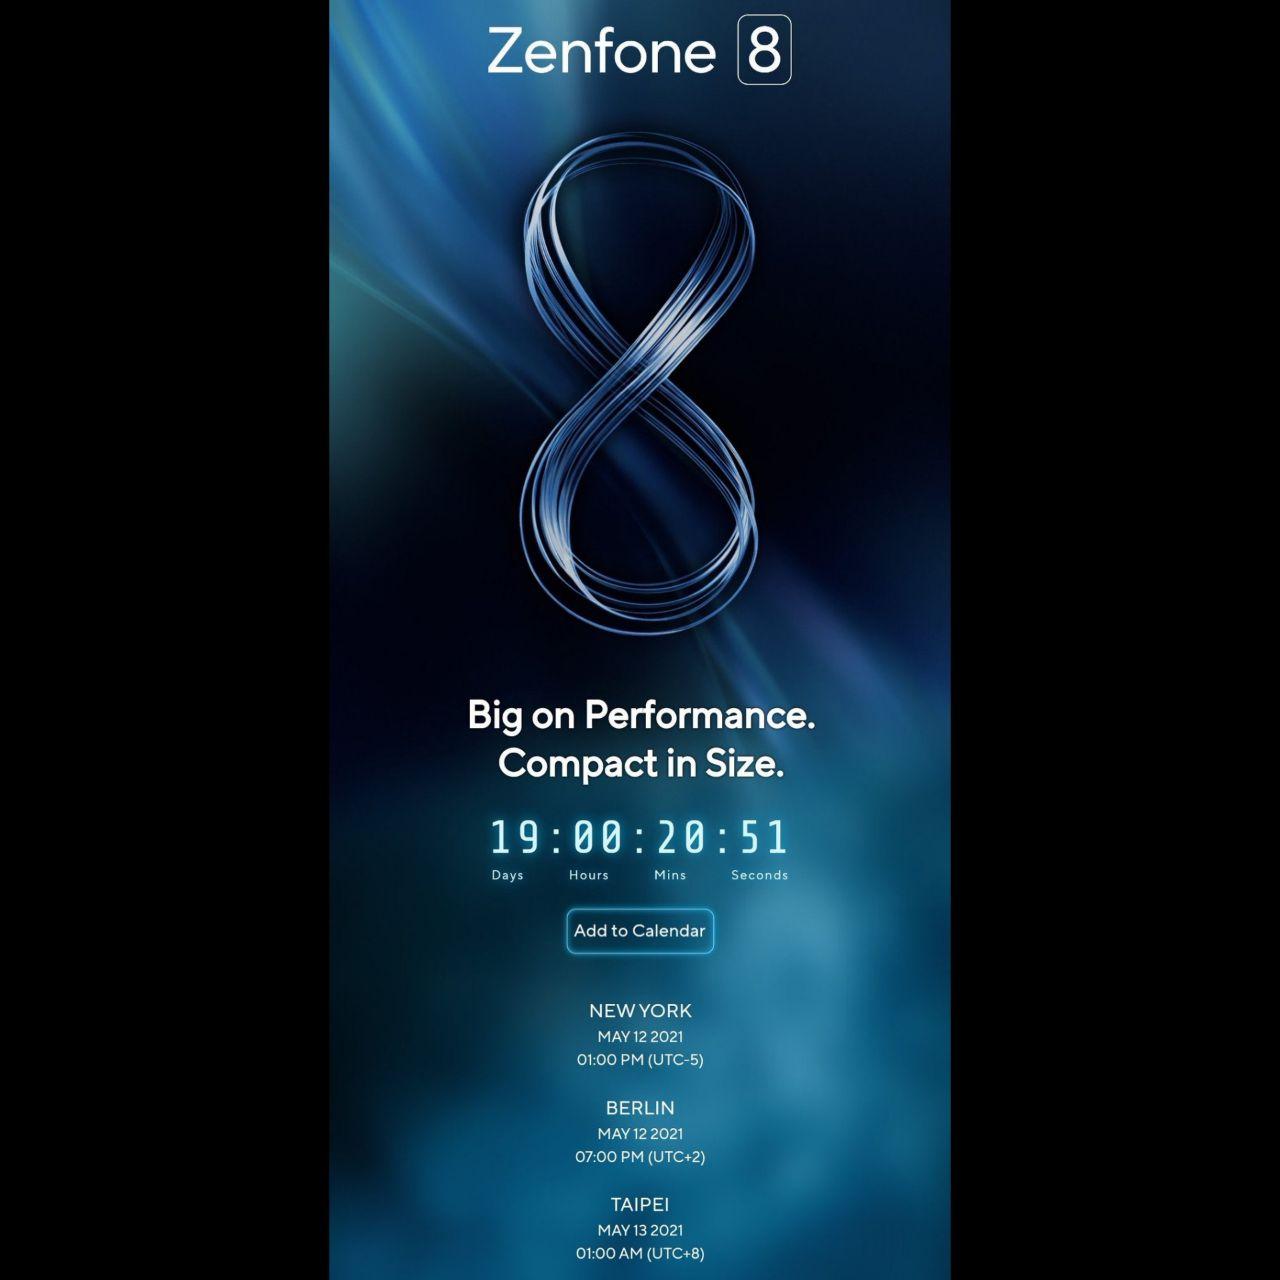 تاریخ رونمایی سری Zenfone 8